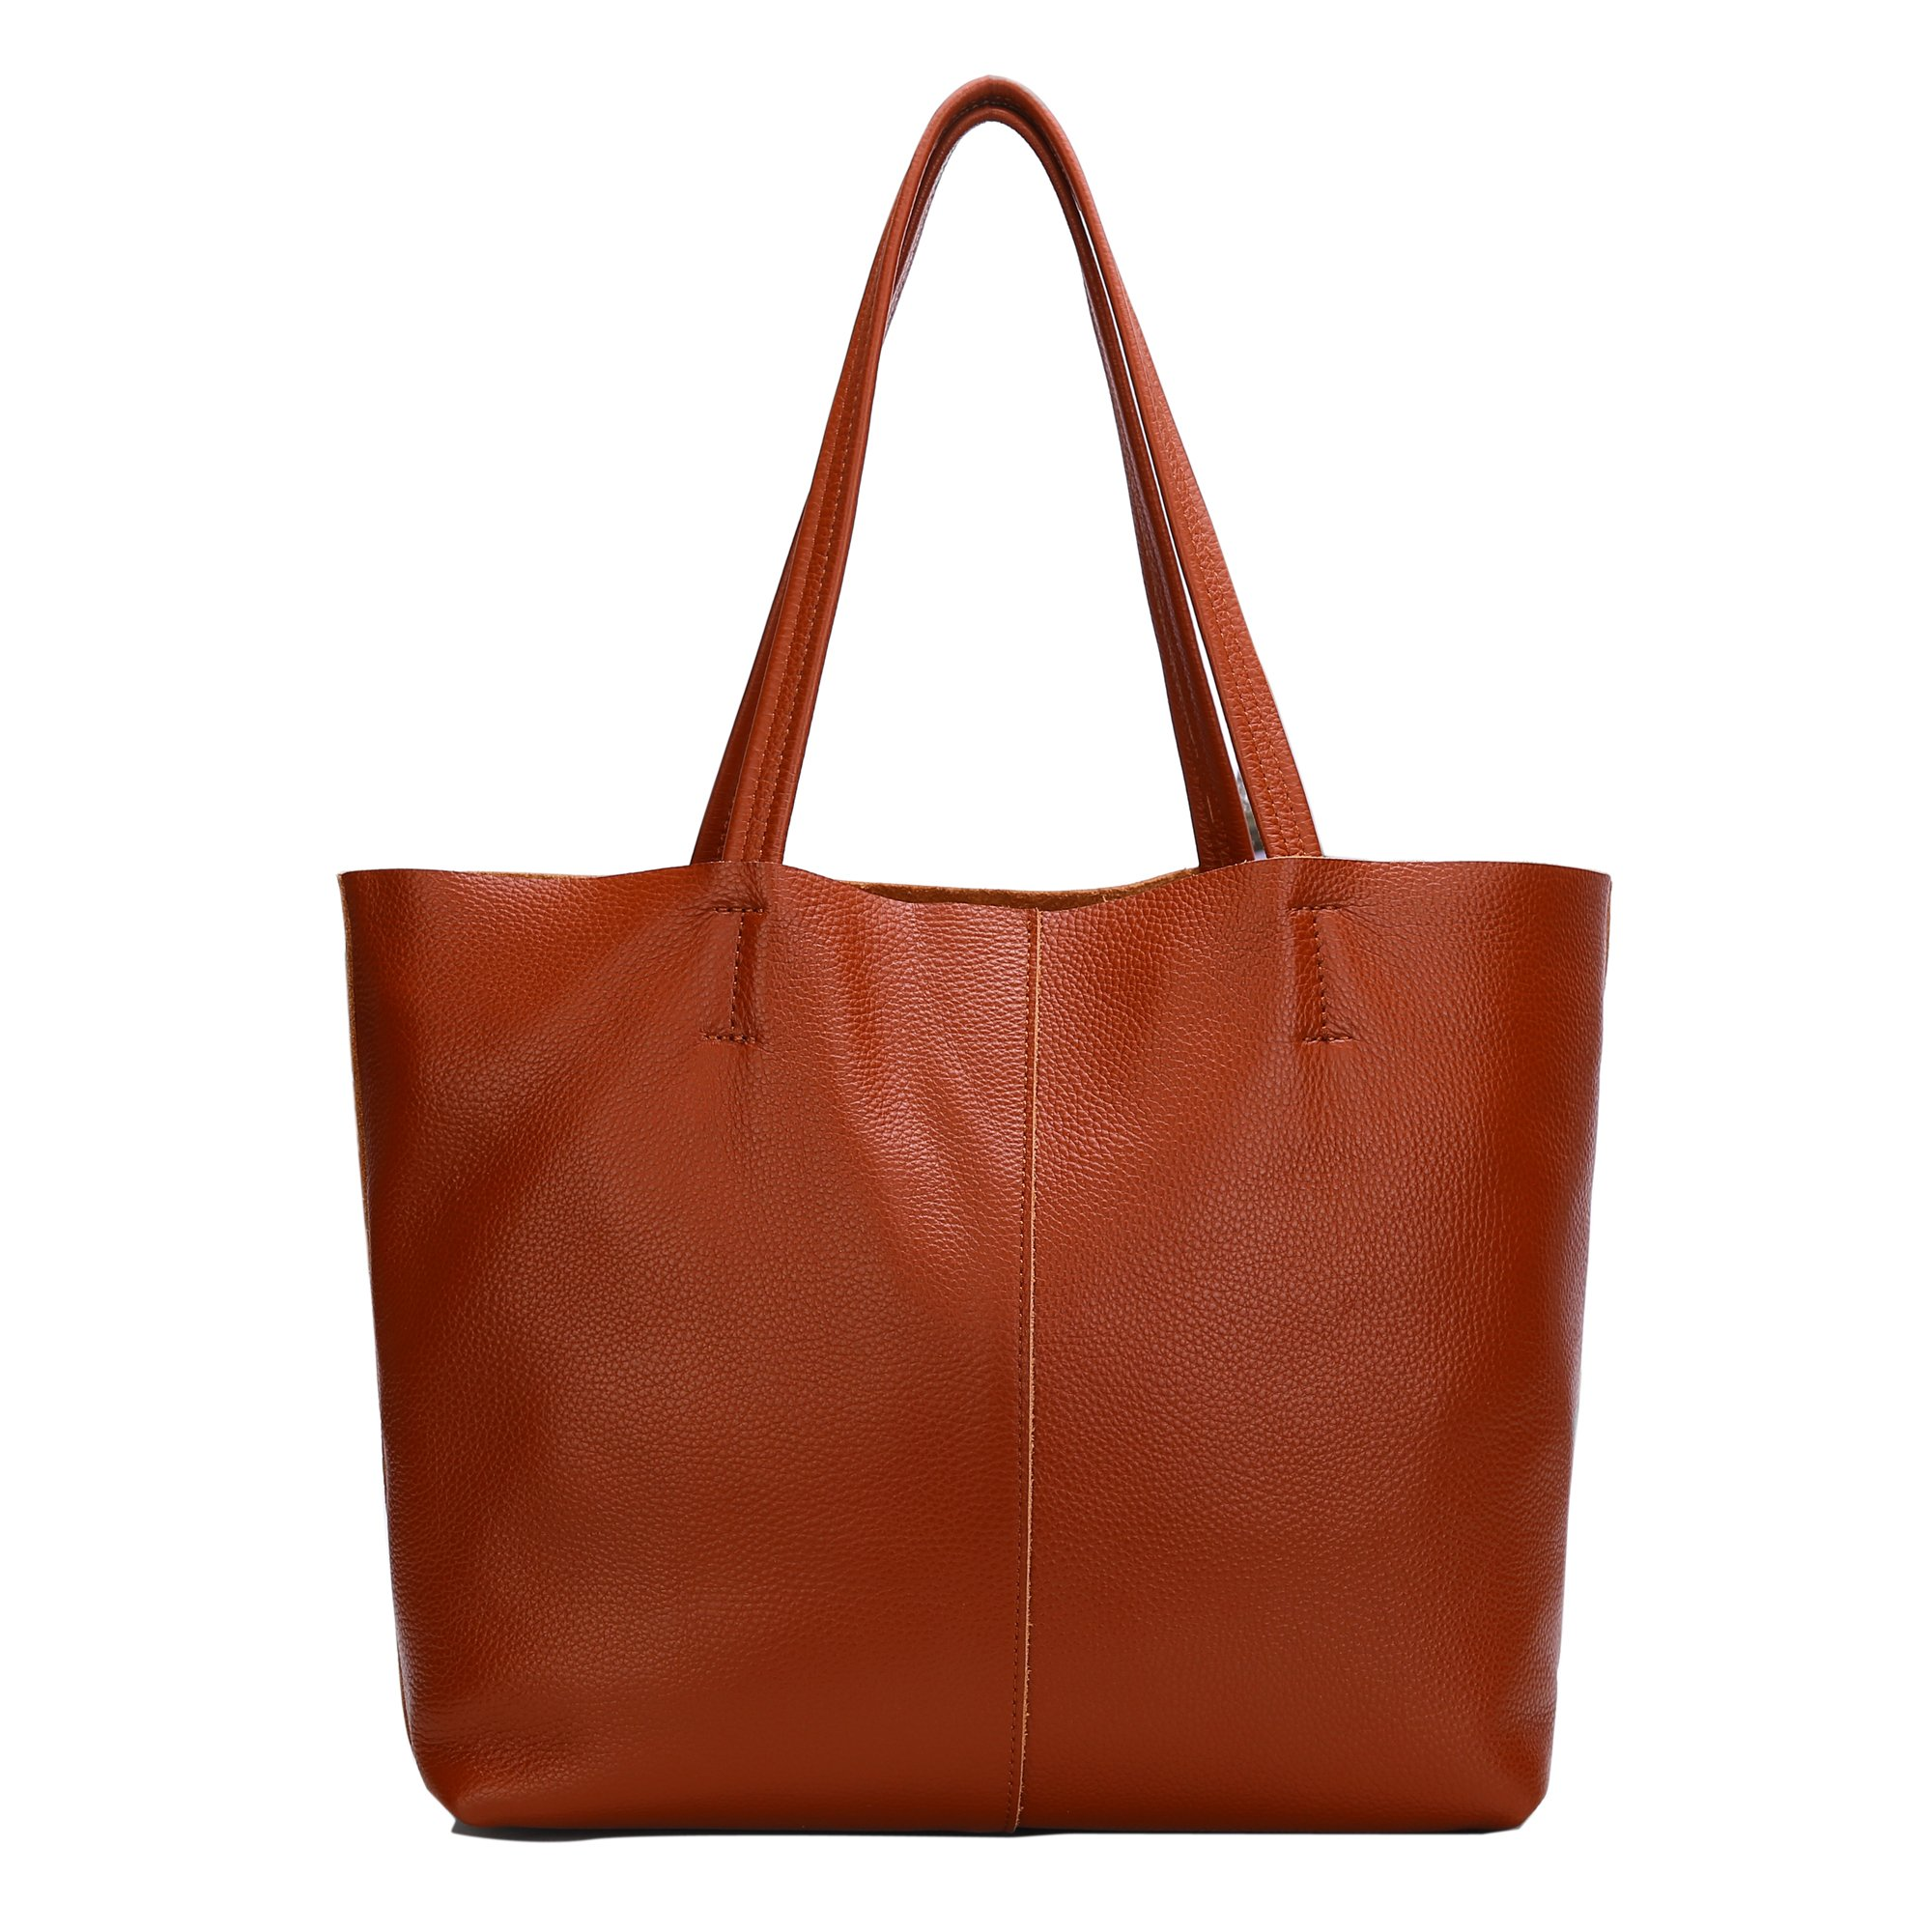 Damero Women's Soft Vintage Leather Shoulder Bag with Removable Lining (Medium, Brown)